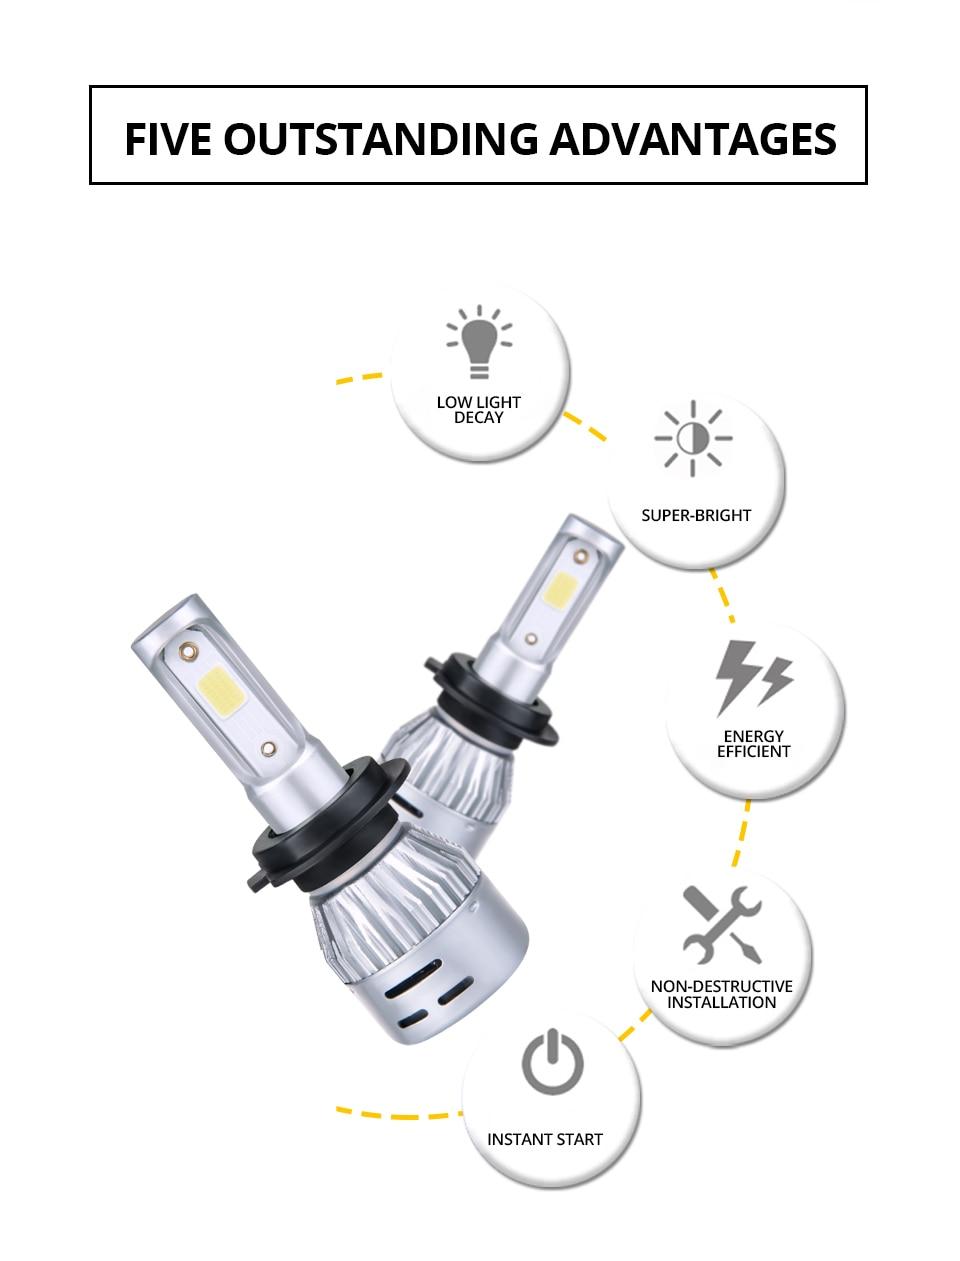 VooVoo 2PCS H4 H7 LED Car Light 72W 8000Lm 9005 9006 H11 4300K 3000K 8000K Car headlights 12V Car Near And Far Lamps Lighting (2)